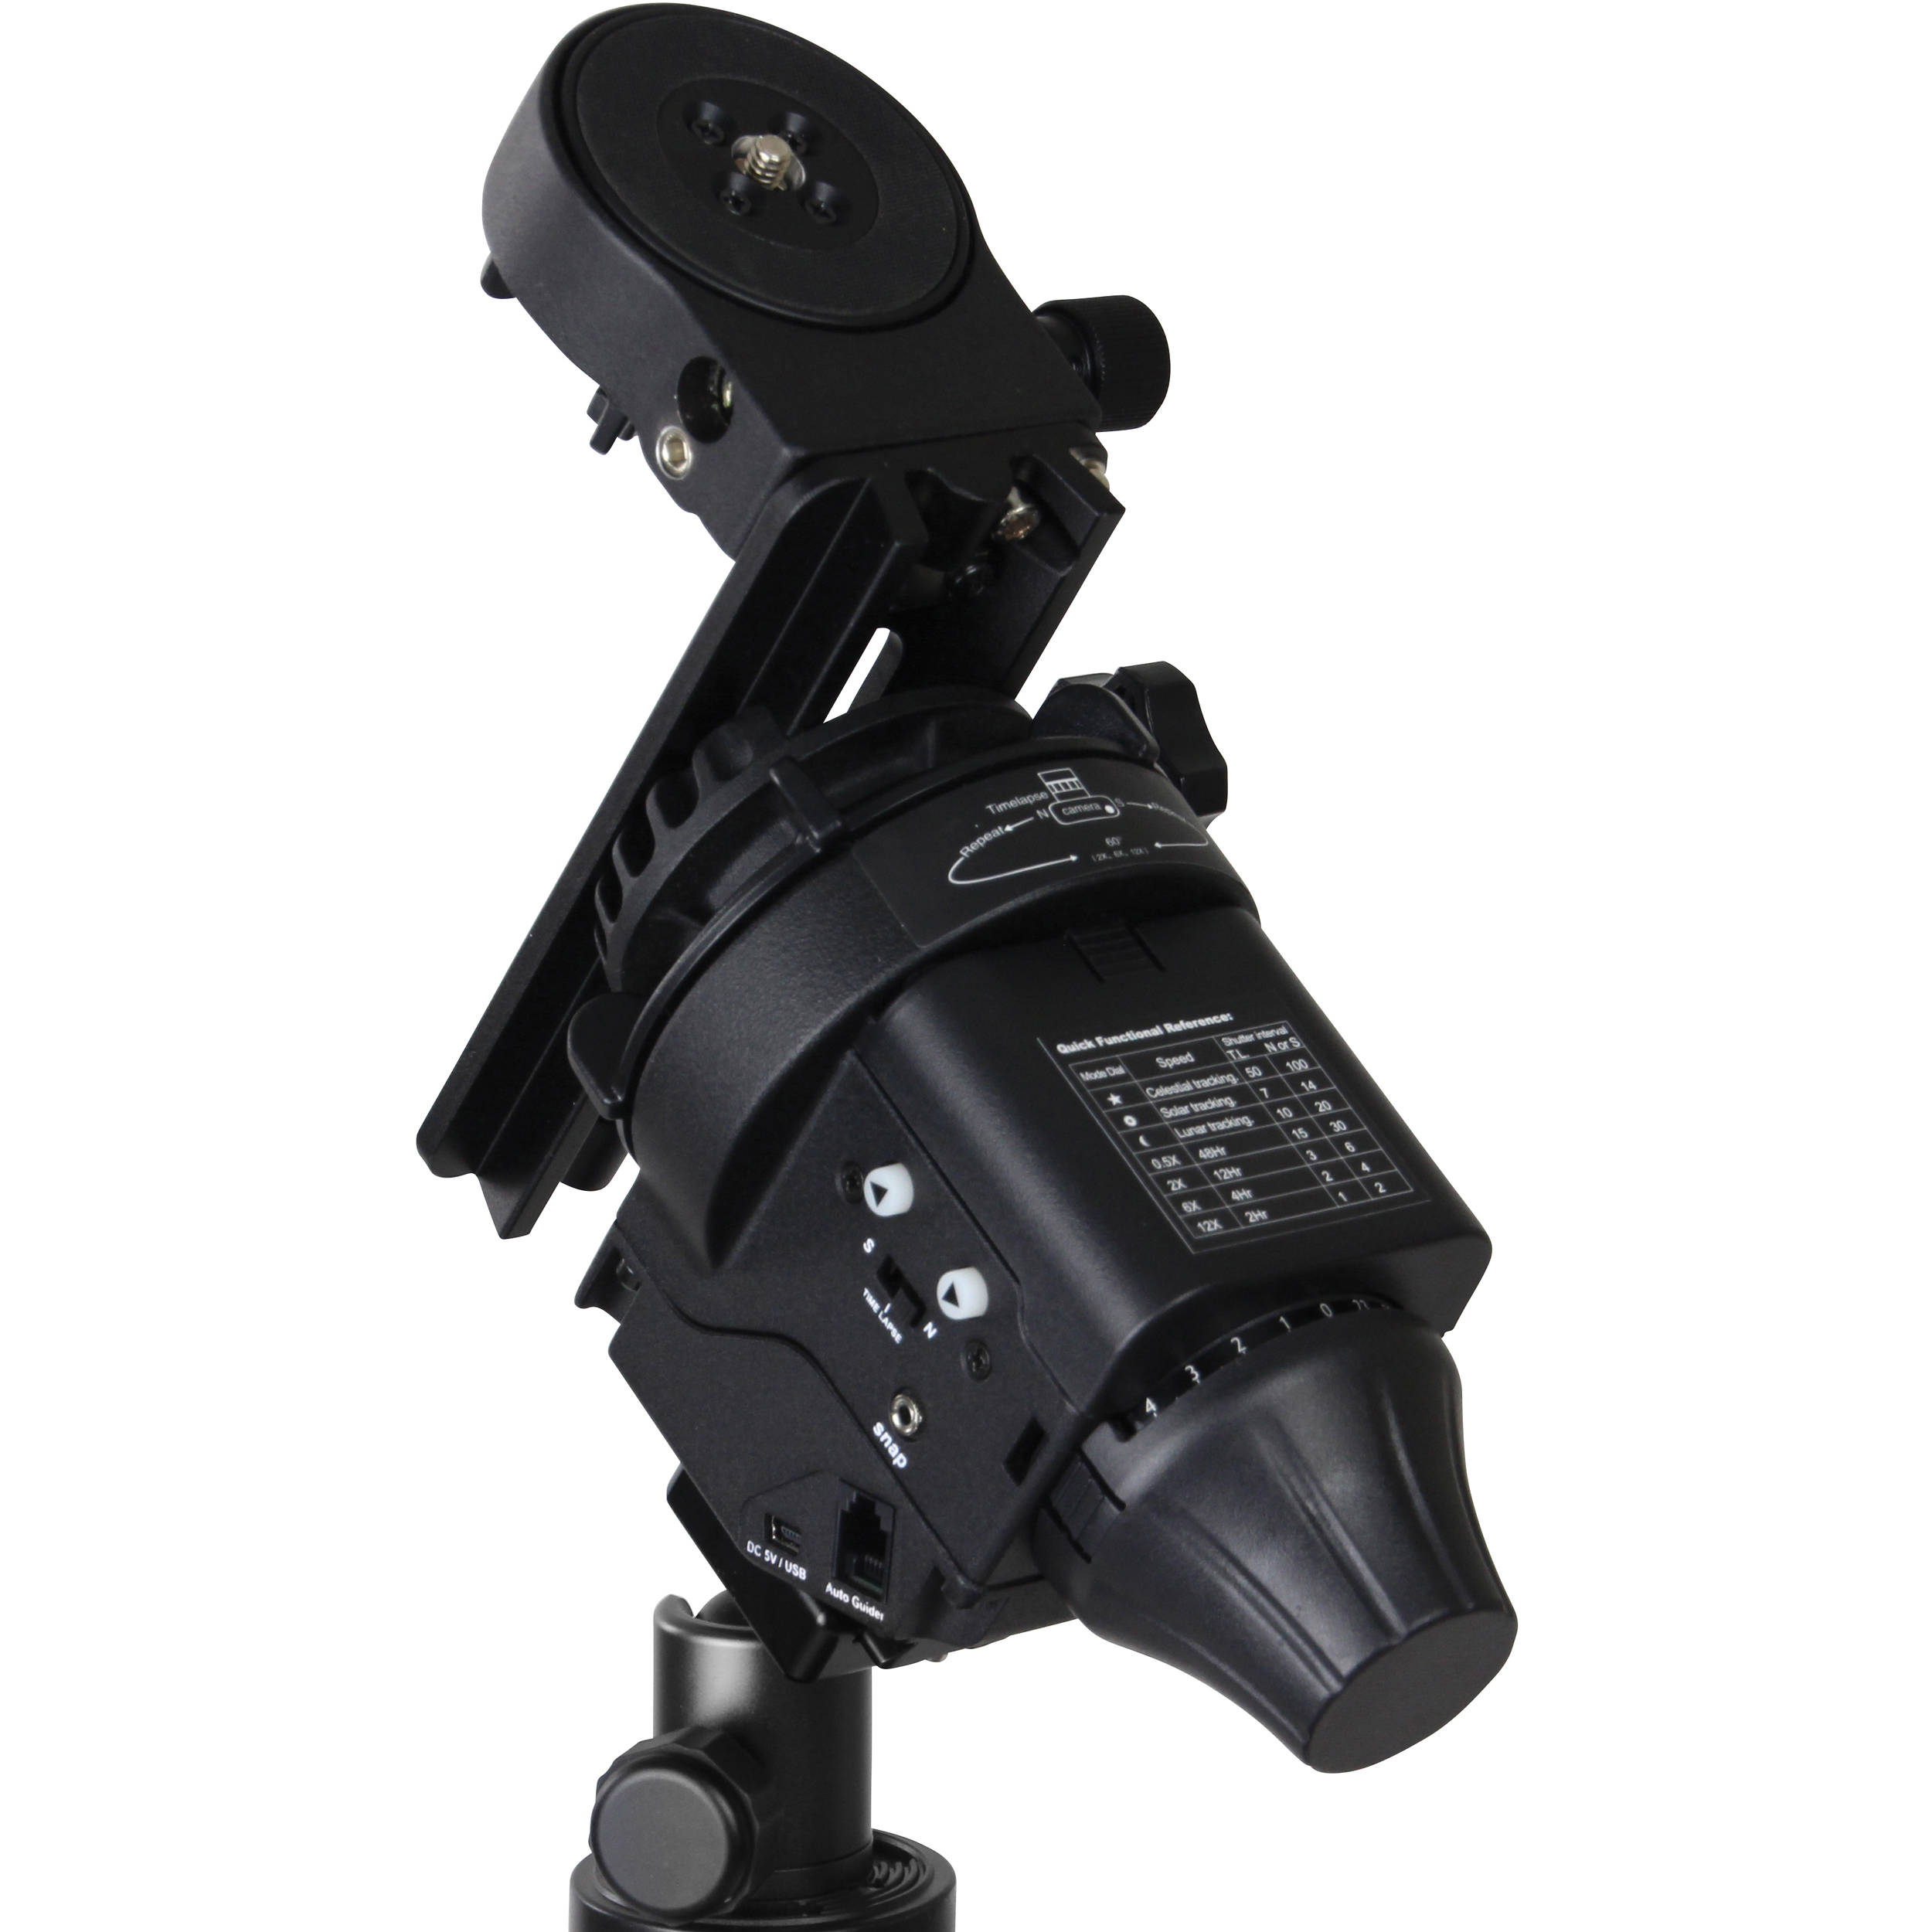 Sky watcher star adventurer motorized mount astro package for Motorized video camera mount